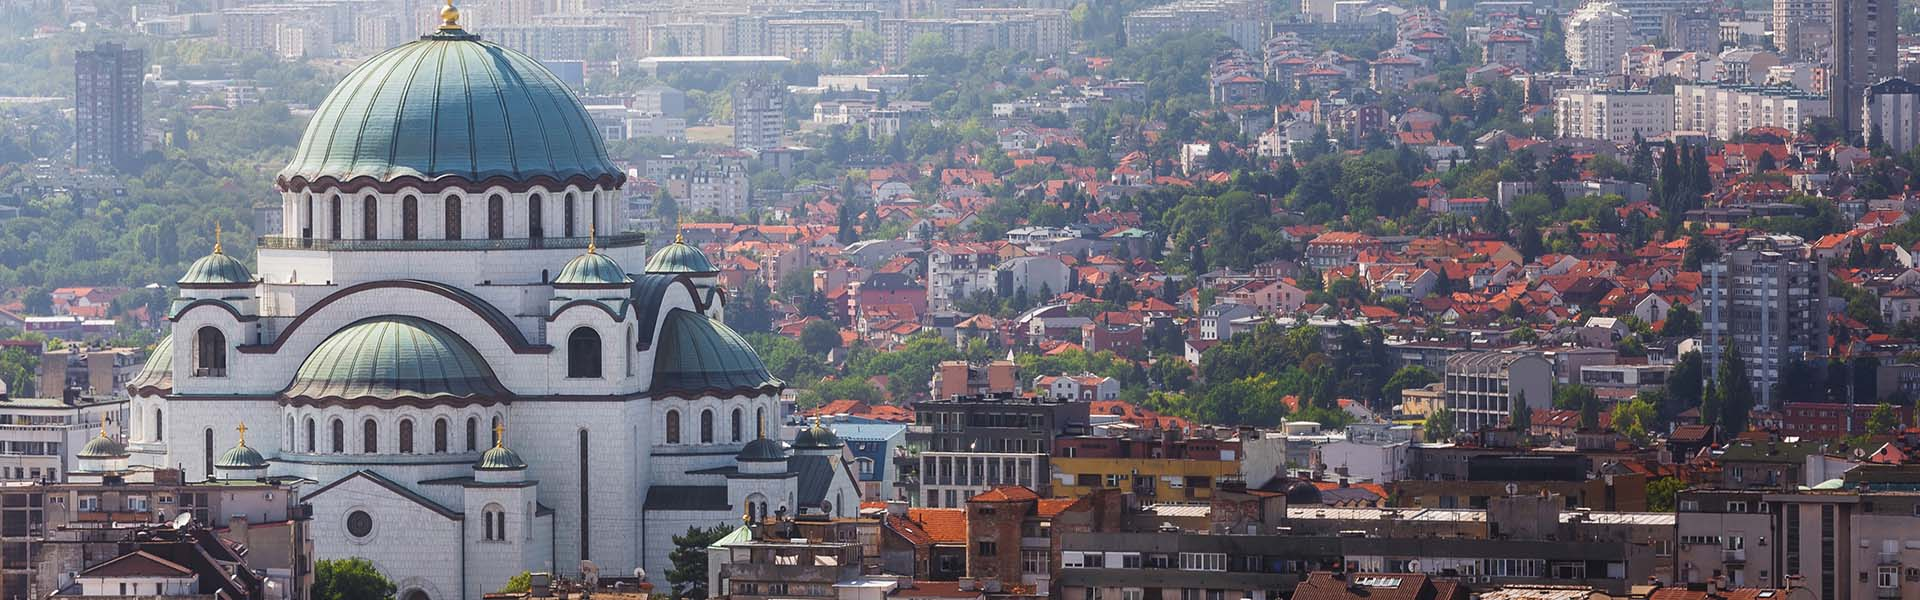 Dostava hrane SC Vračar | Beograd